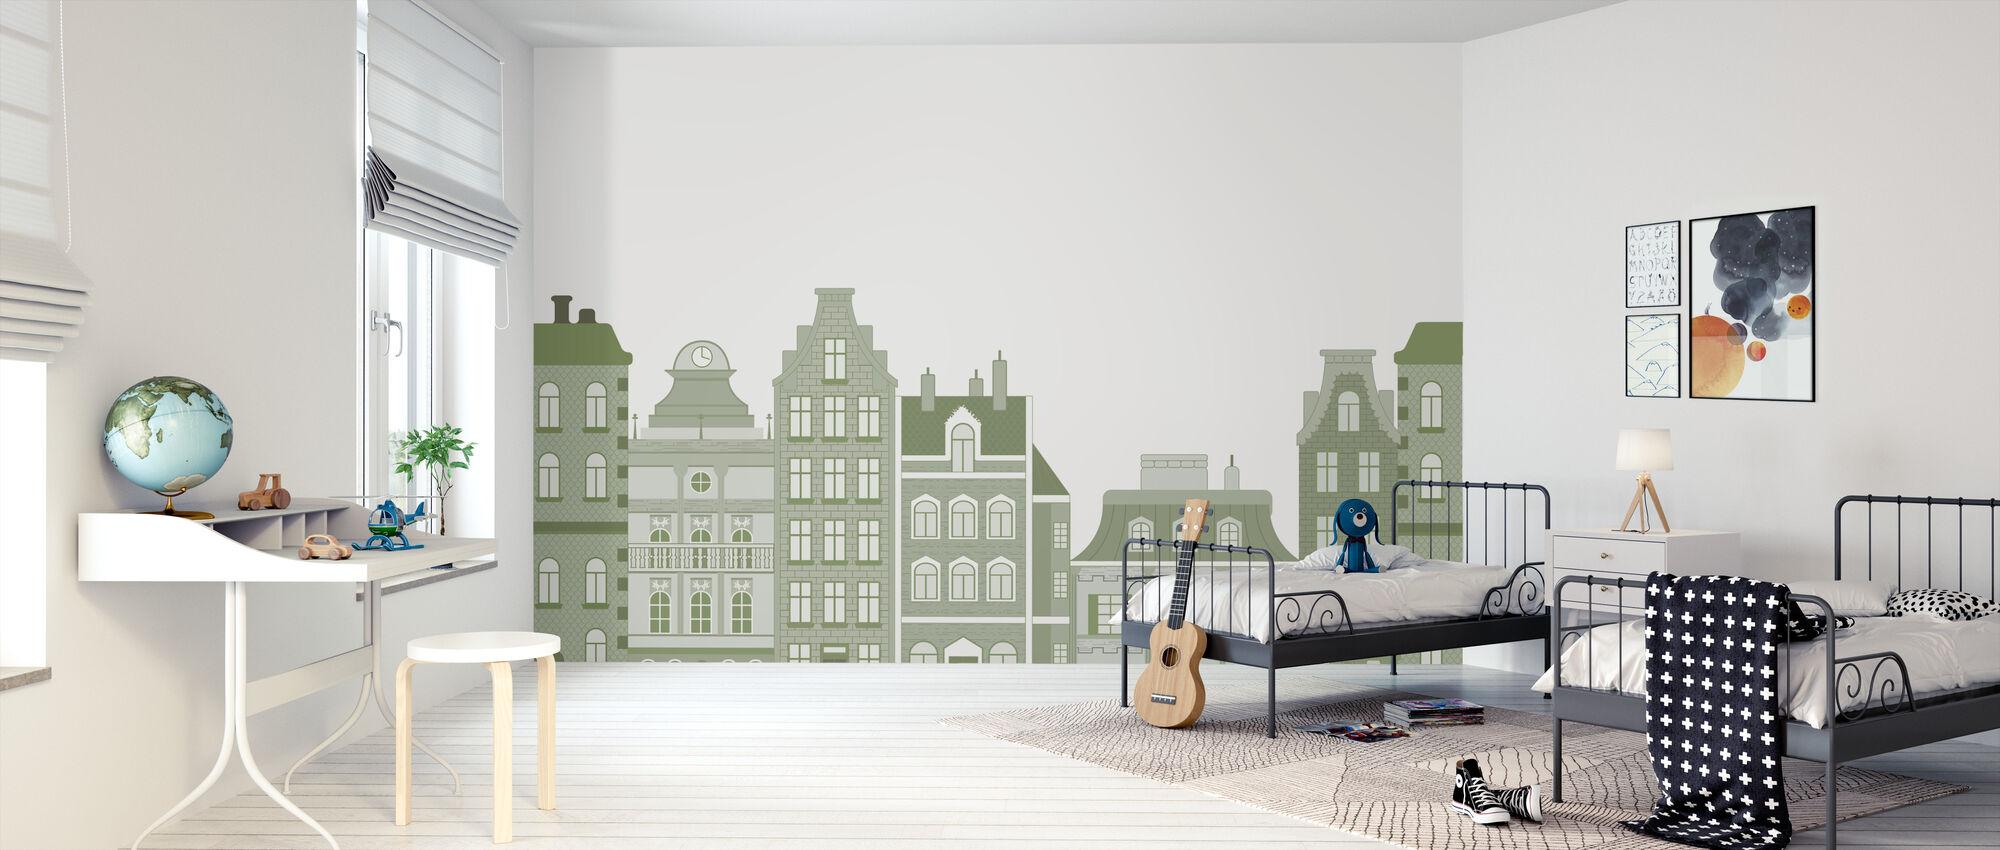 Old Town Green - Wallpaper - Kids Room